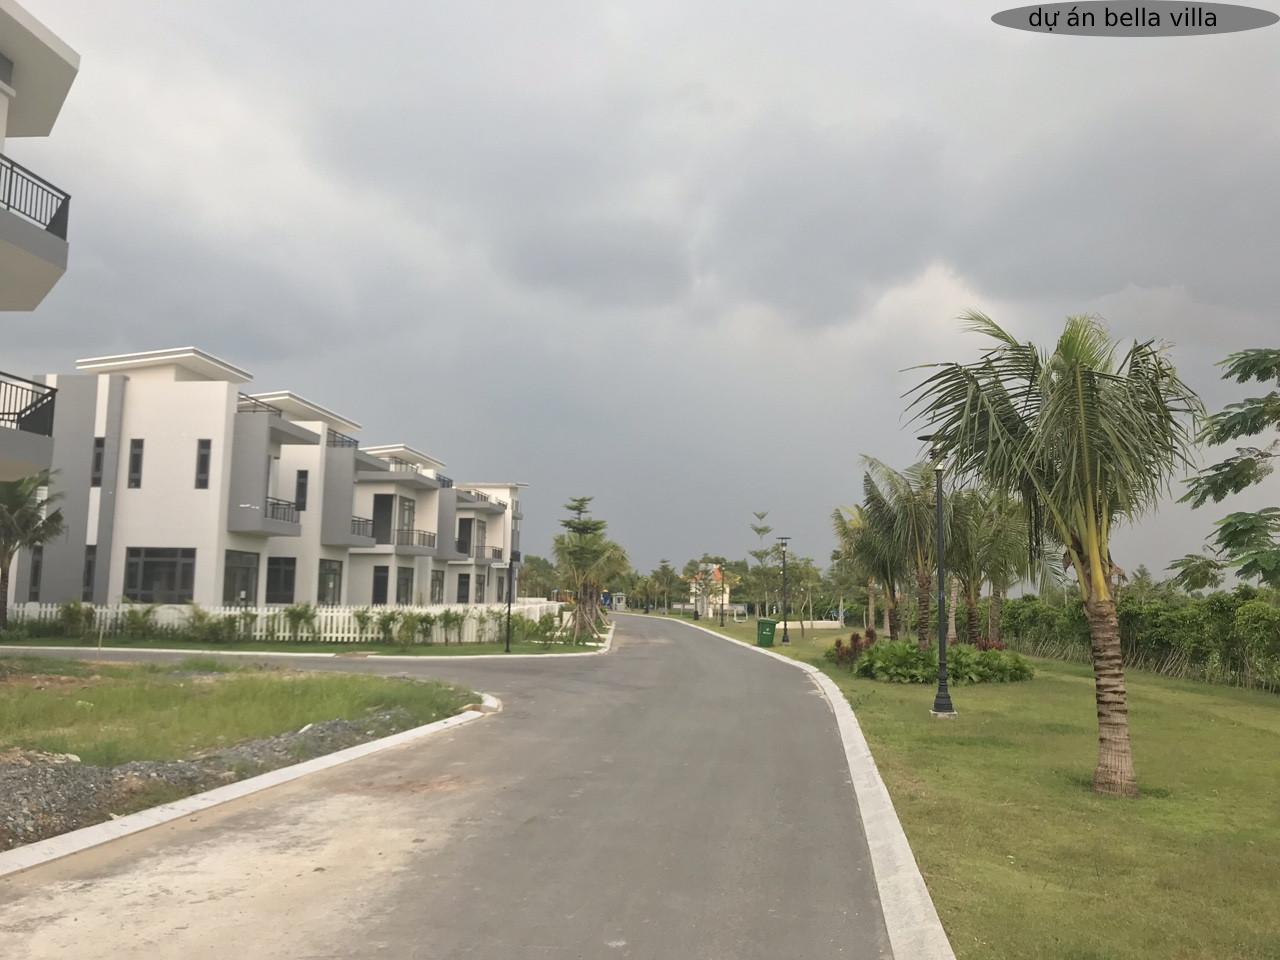 tiến độ dự án bella villa